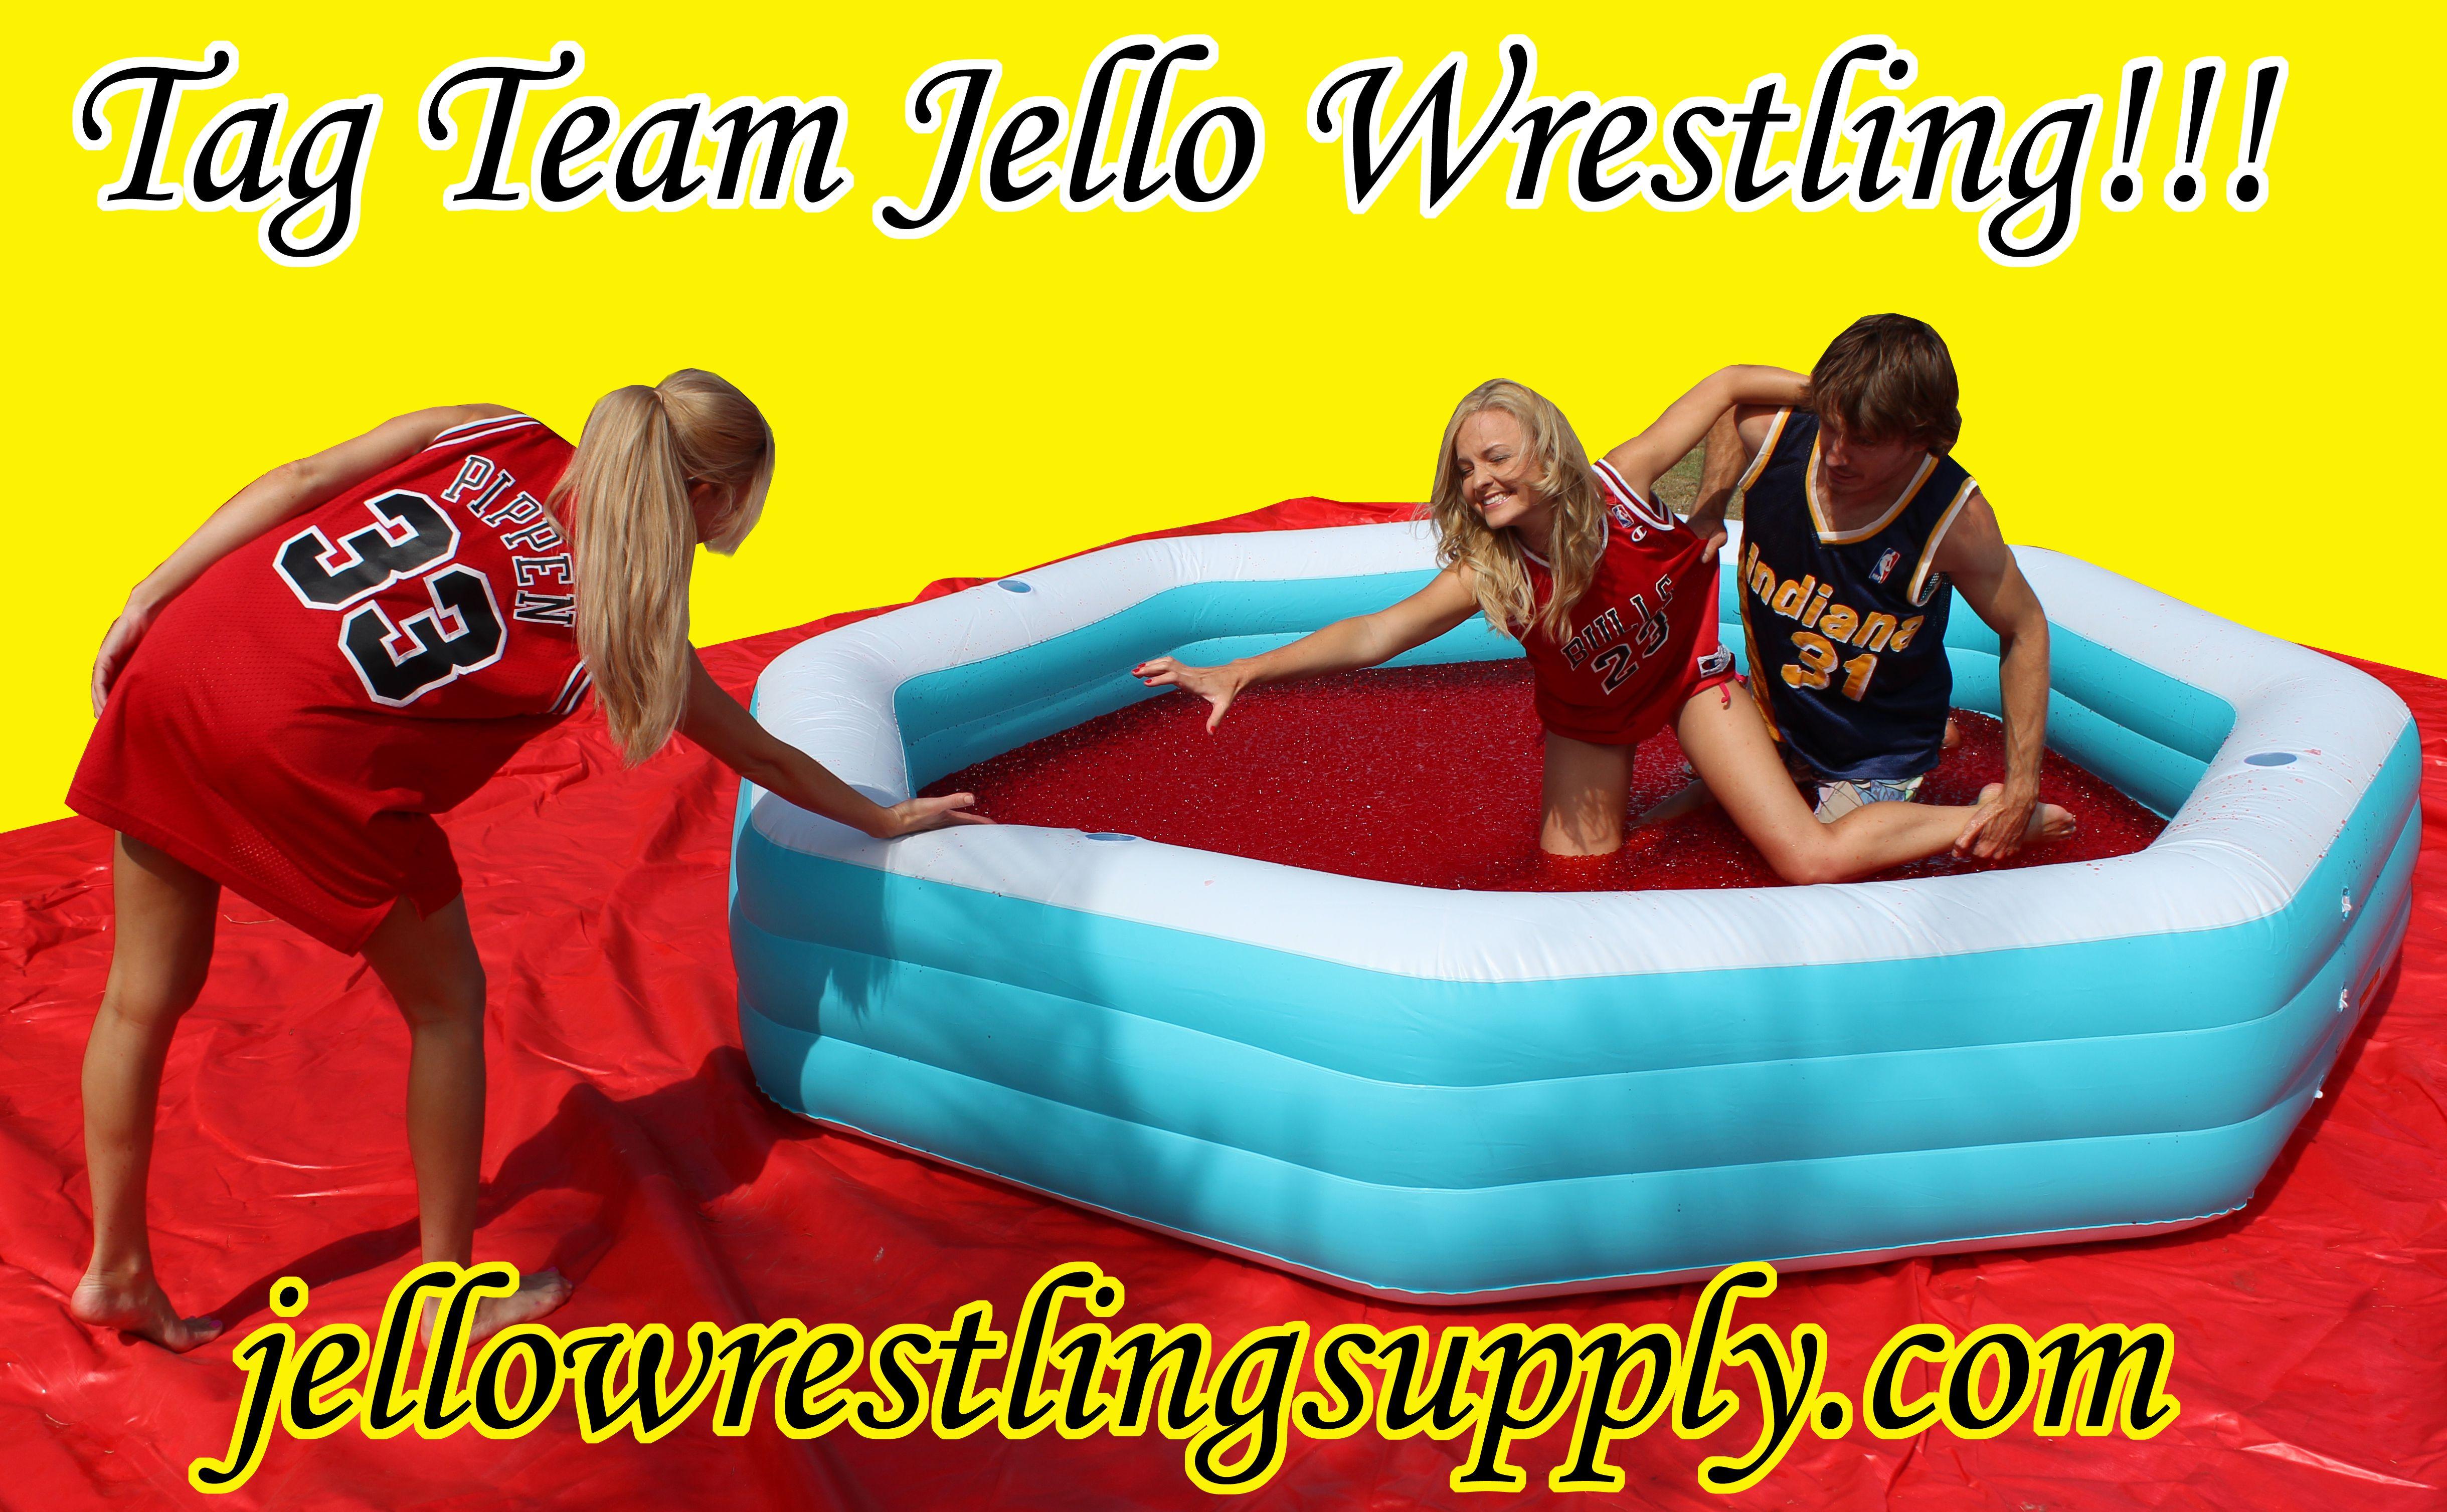 Jello Wrestling Rules How To Run A Tournament Fundraiser Ideas Wrestling Rules Wrestling Tournaments Wrestling